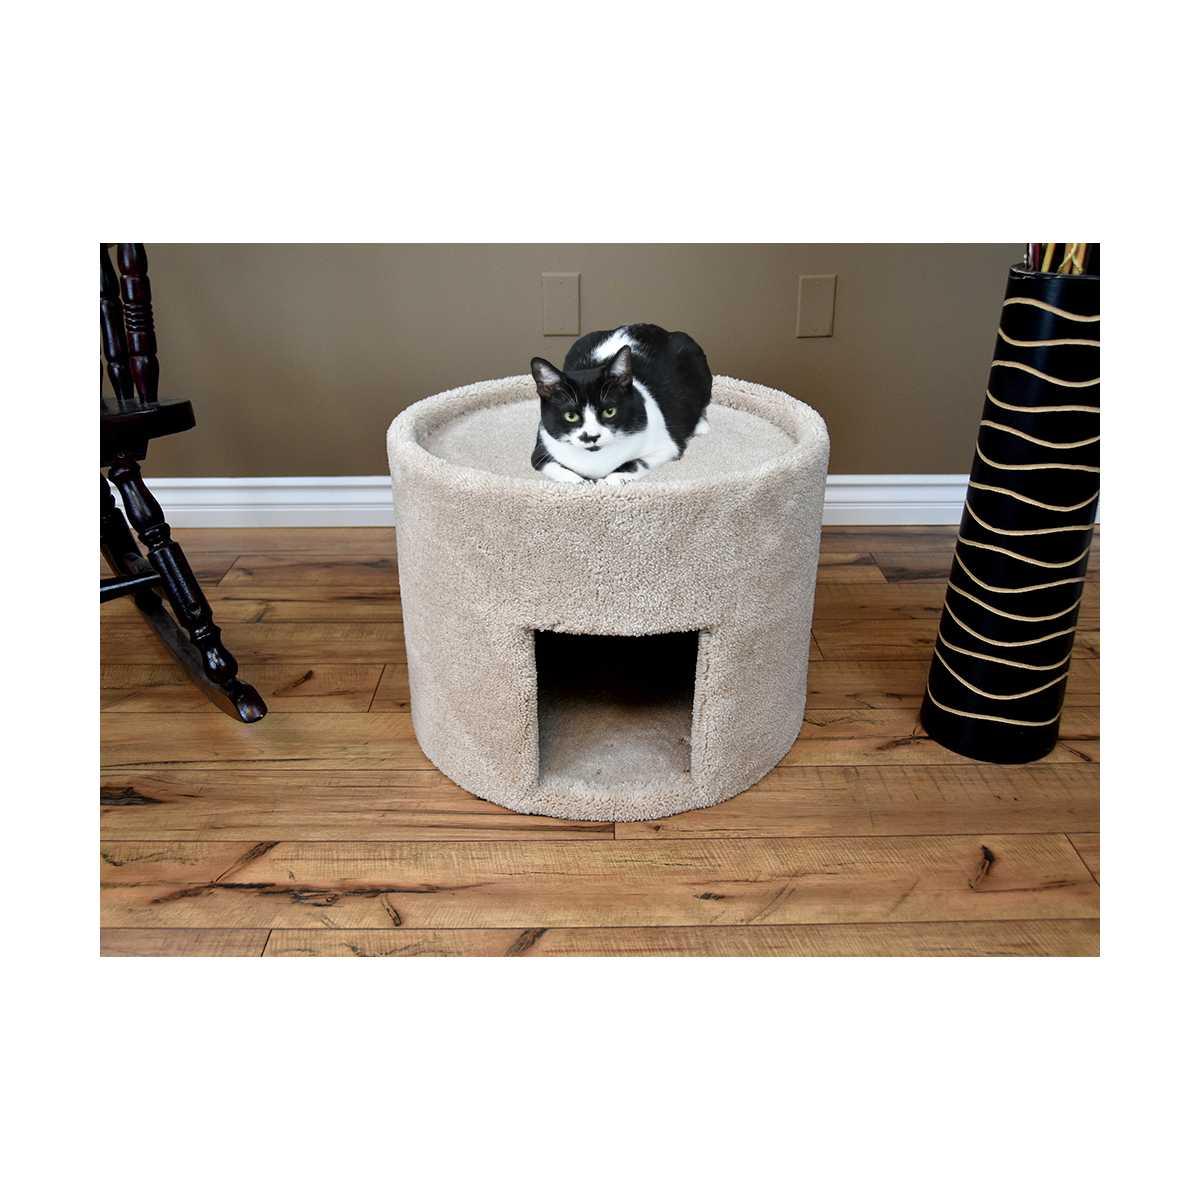 Cat S Choice Giant Big Boy Cat Condo 110120 Catsplay Superstore